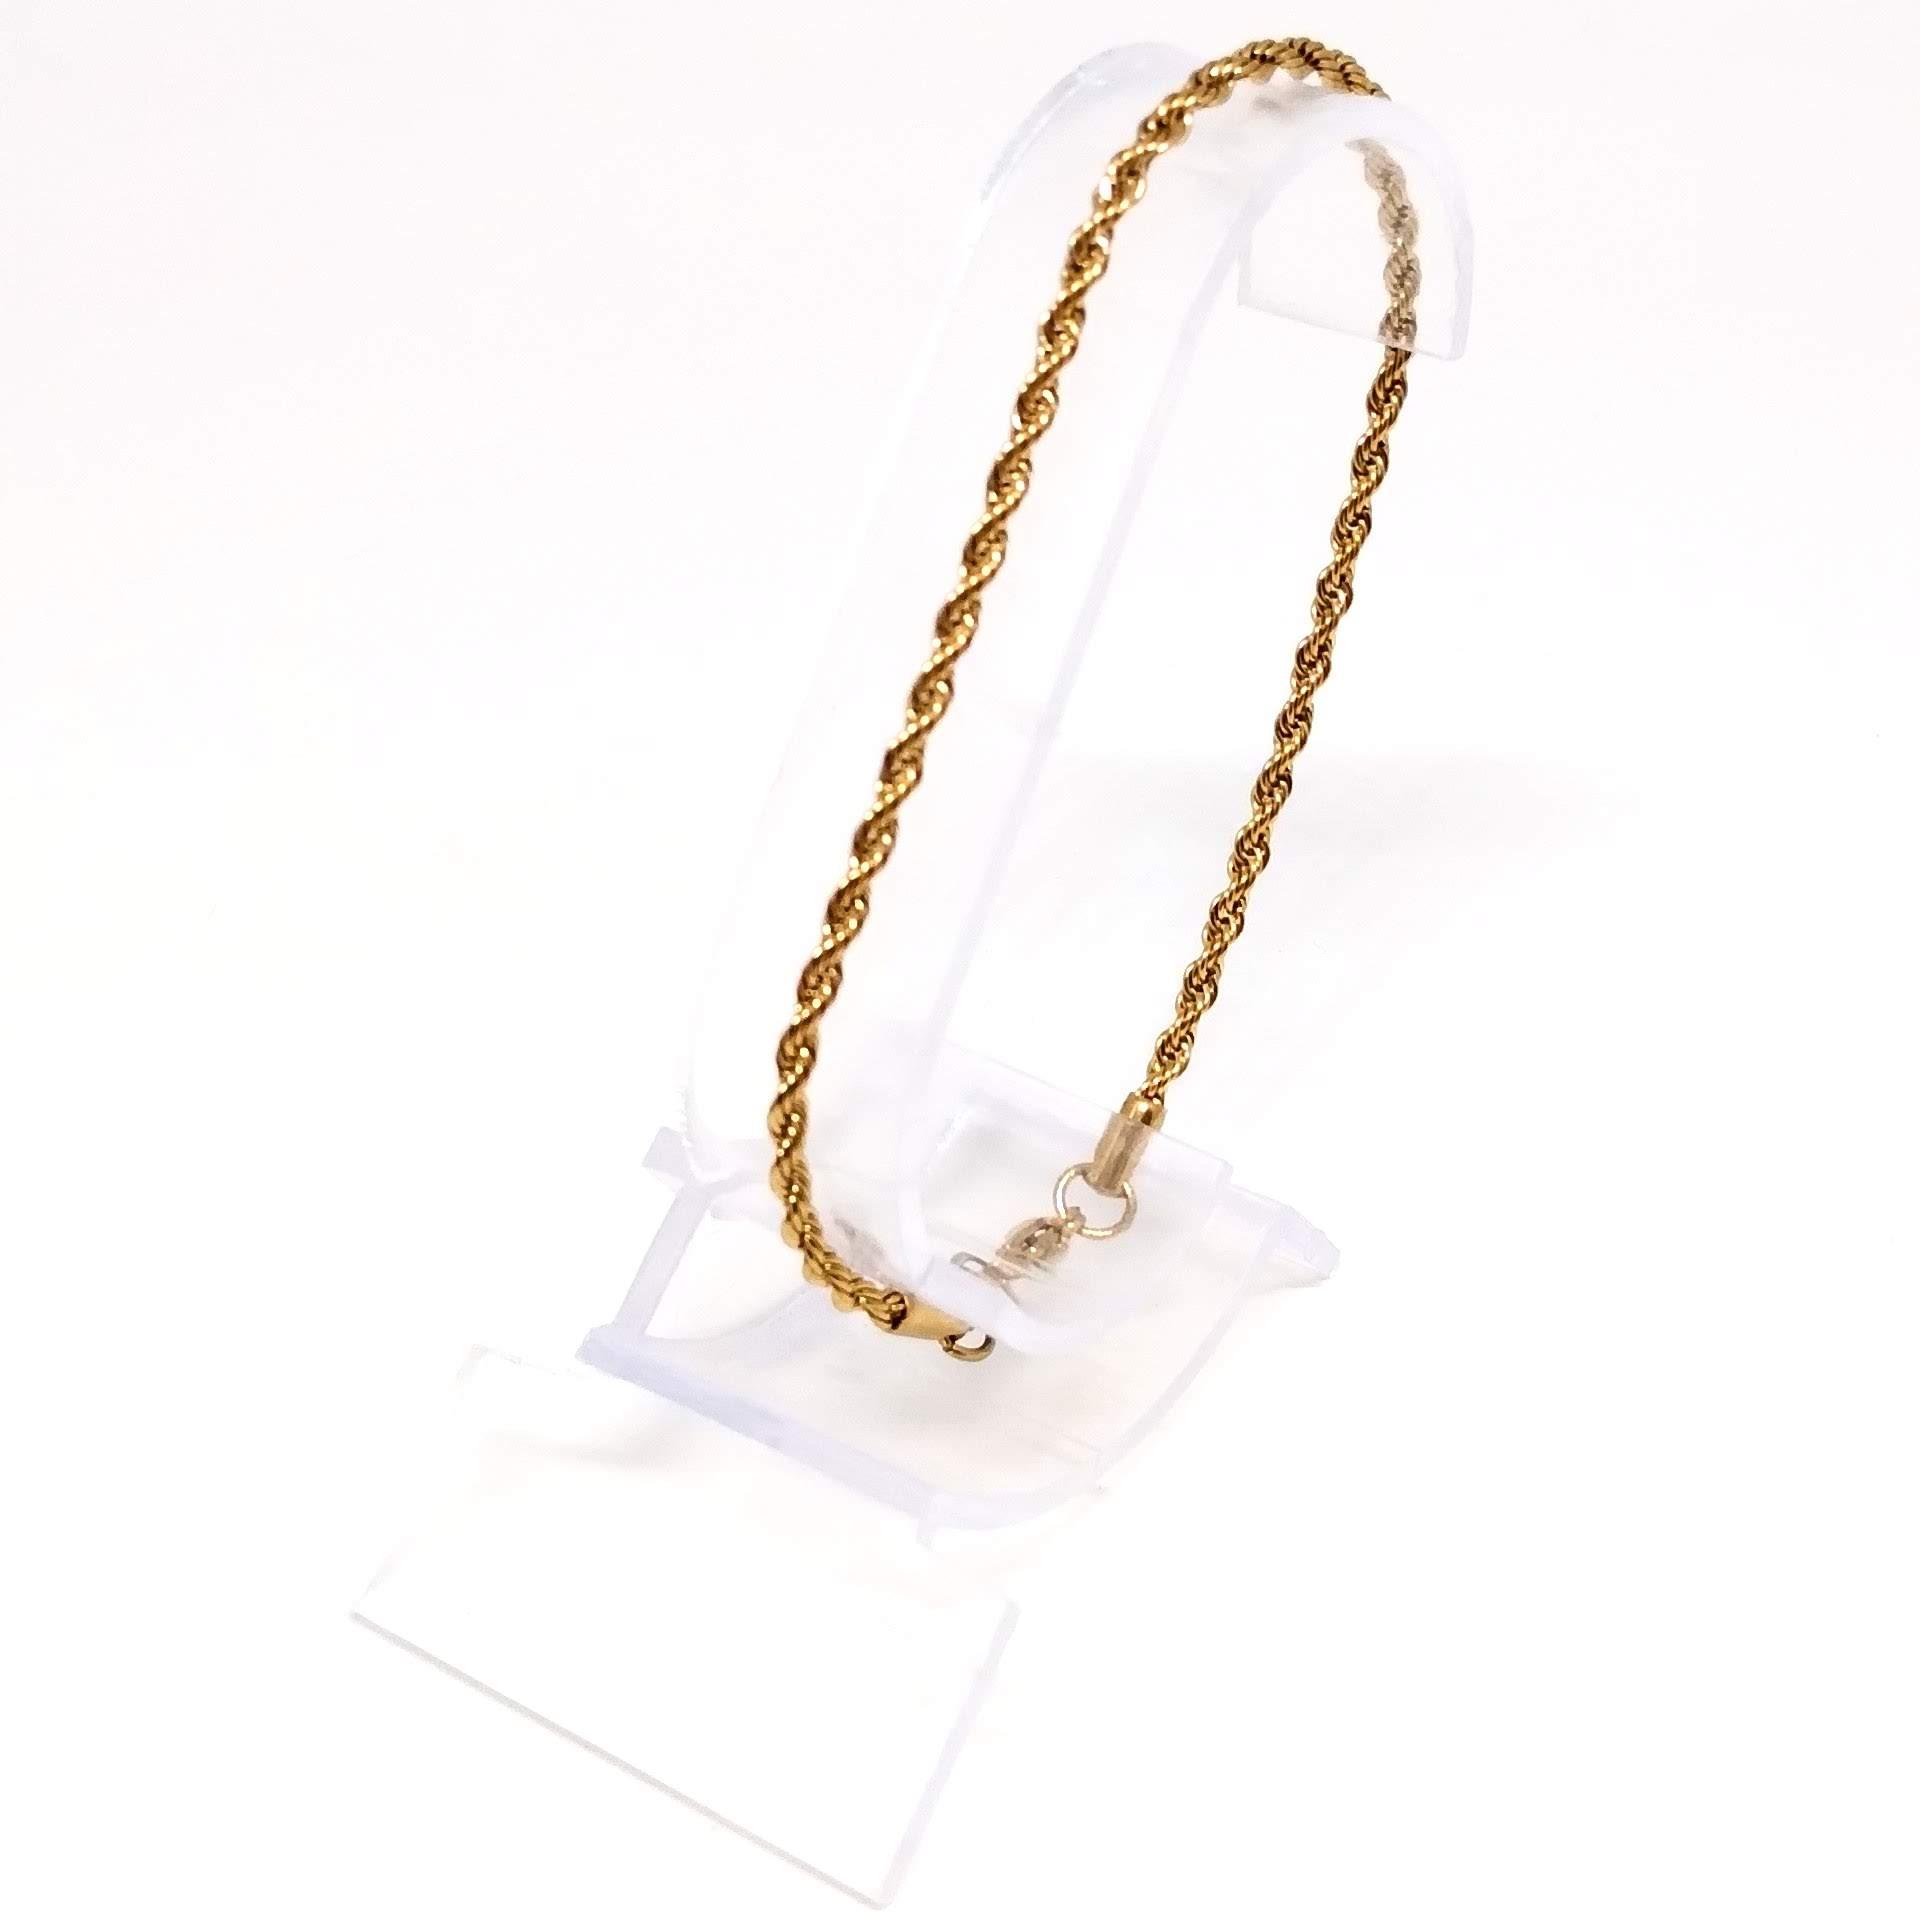 Pulseira Banhada Ouro 18k Malha Corda 19cm 2,5mm